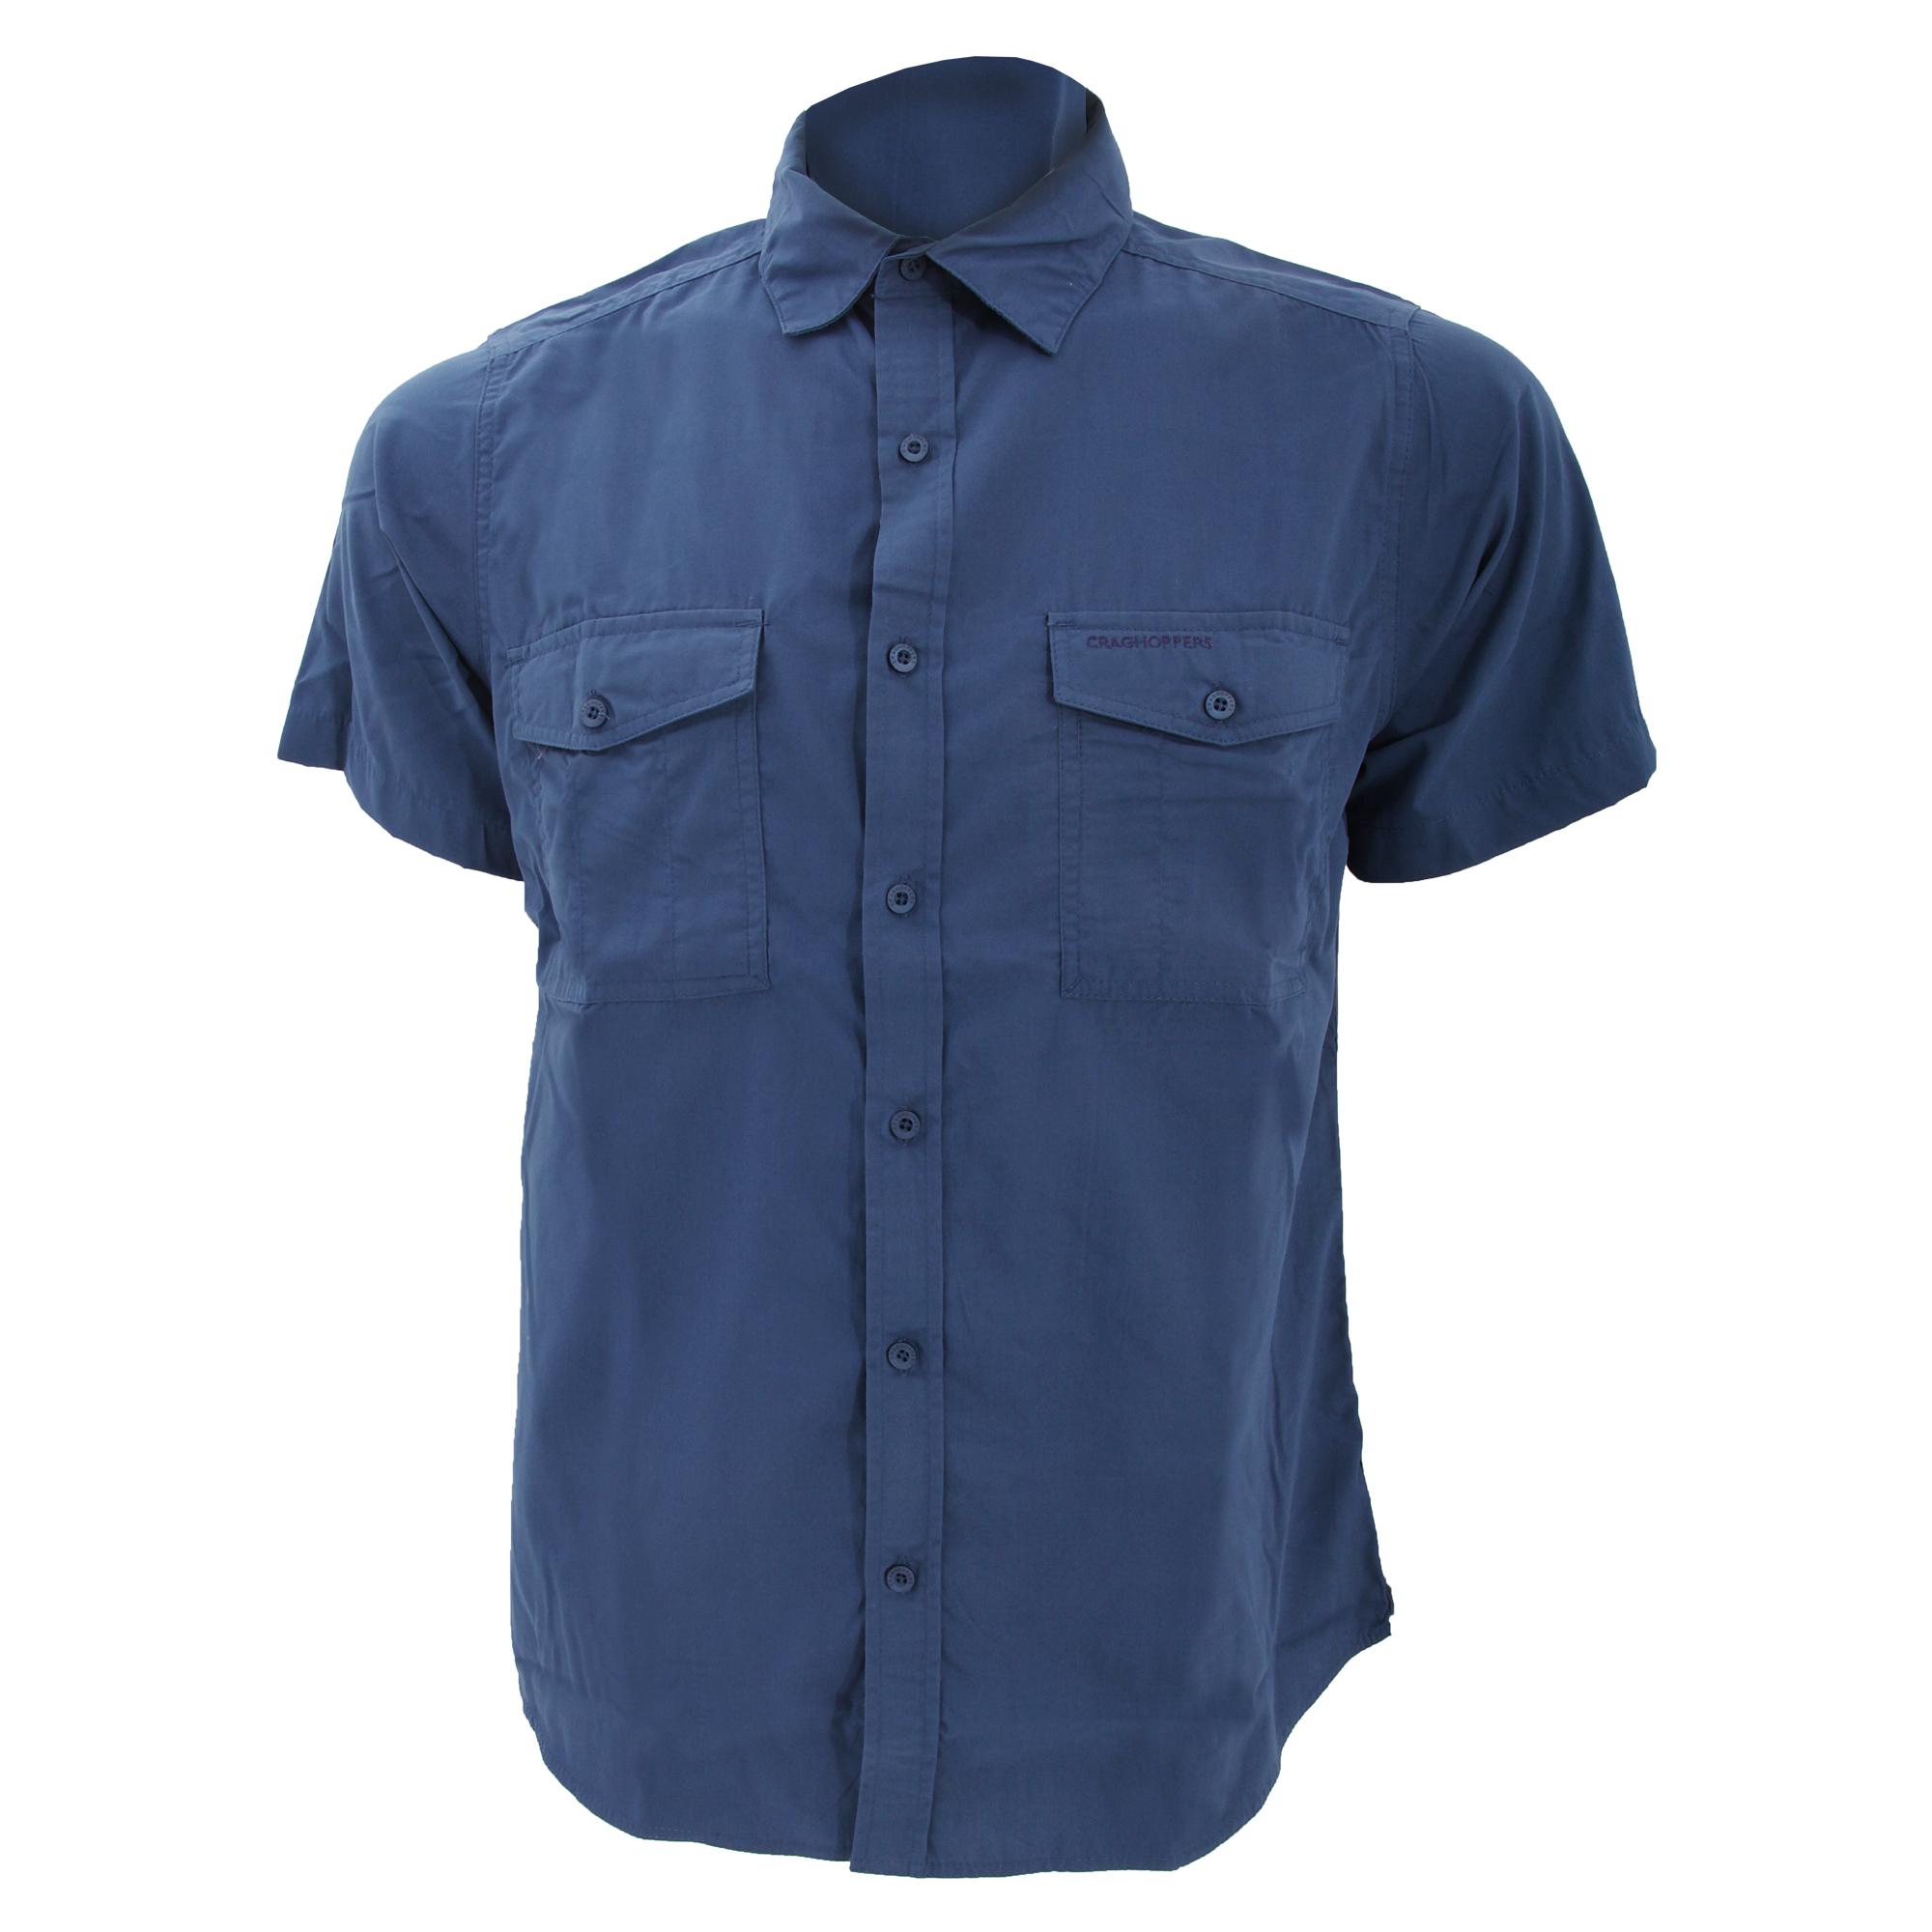 Craghoppers mens kiwi short sleeve casual shirt ebay for Short sleeve casual shirt